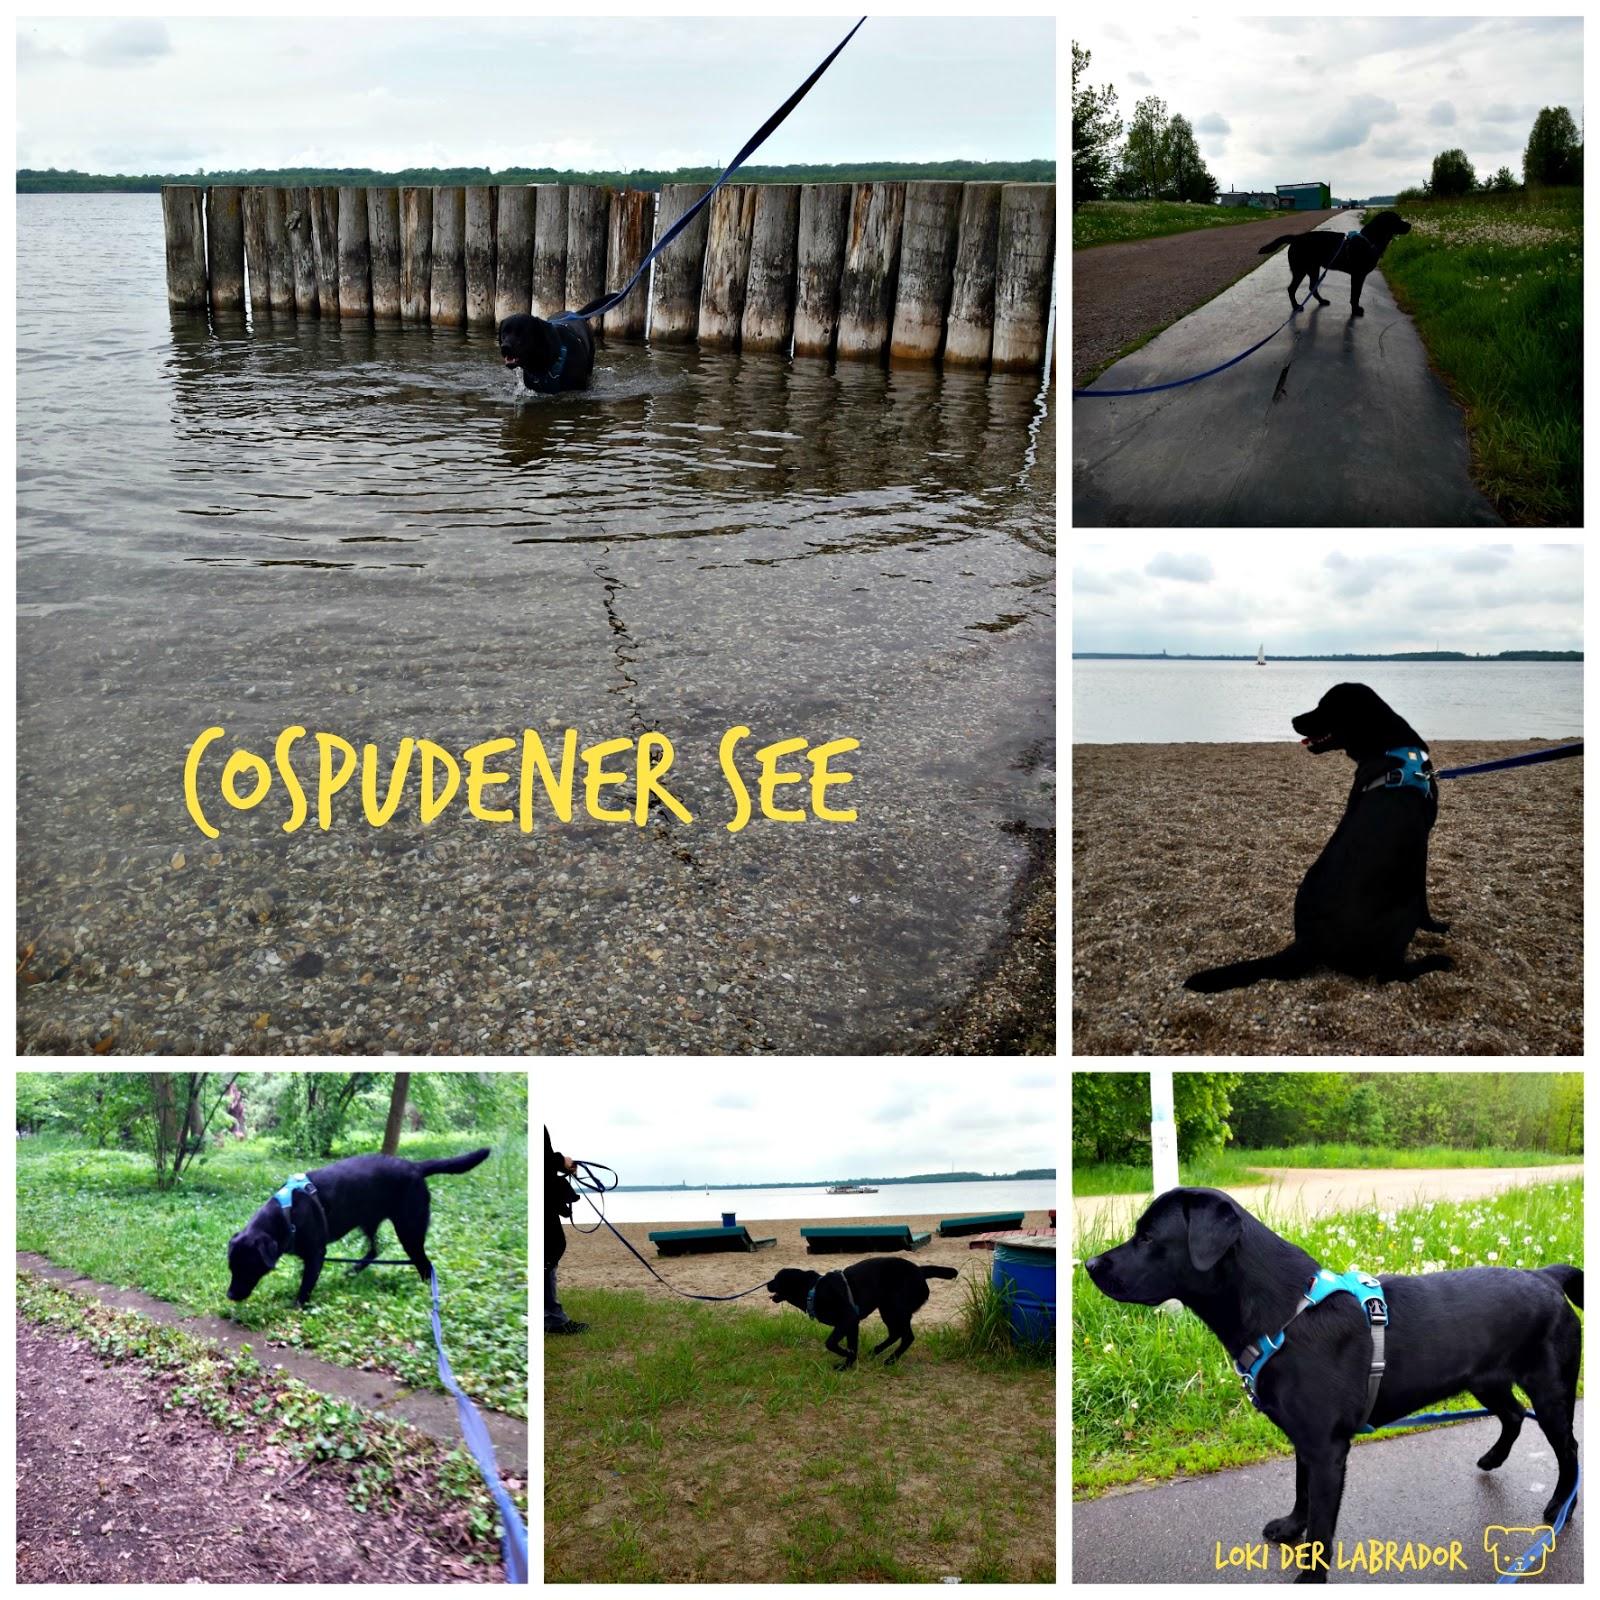 Cospudener See Schwarzer Labrador